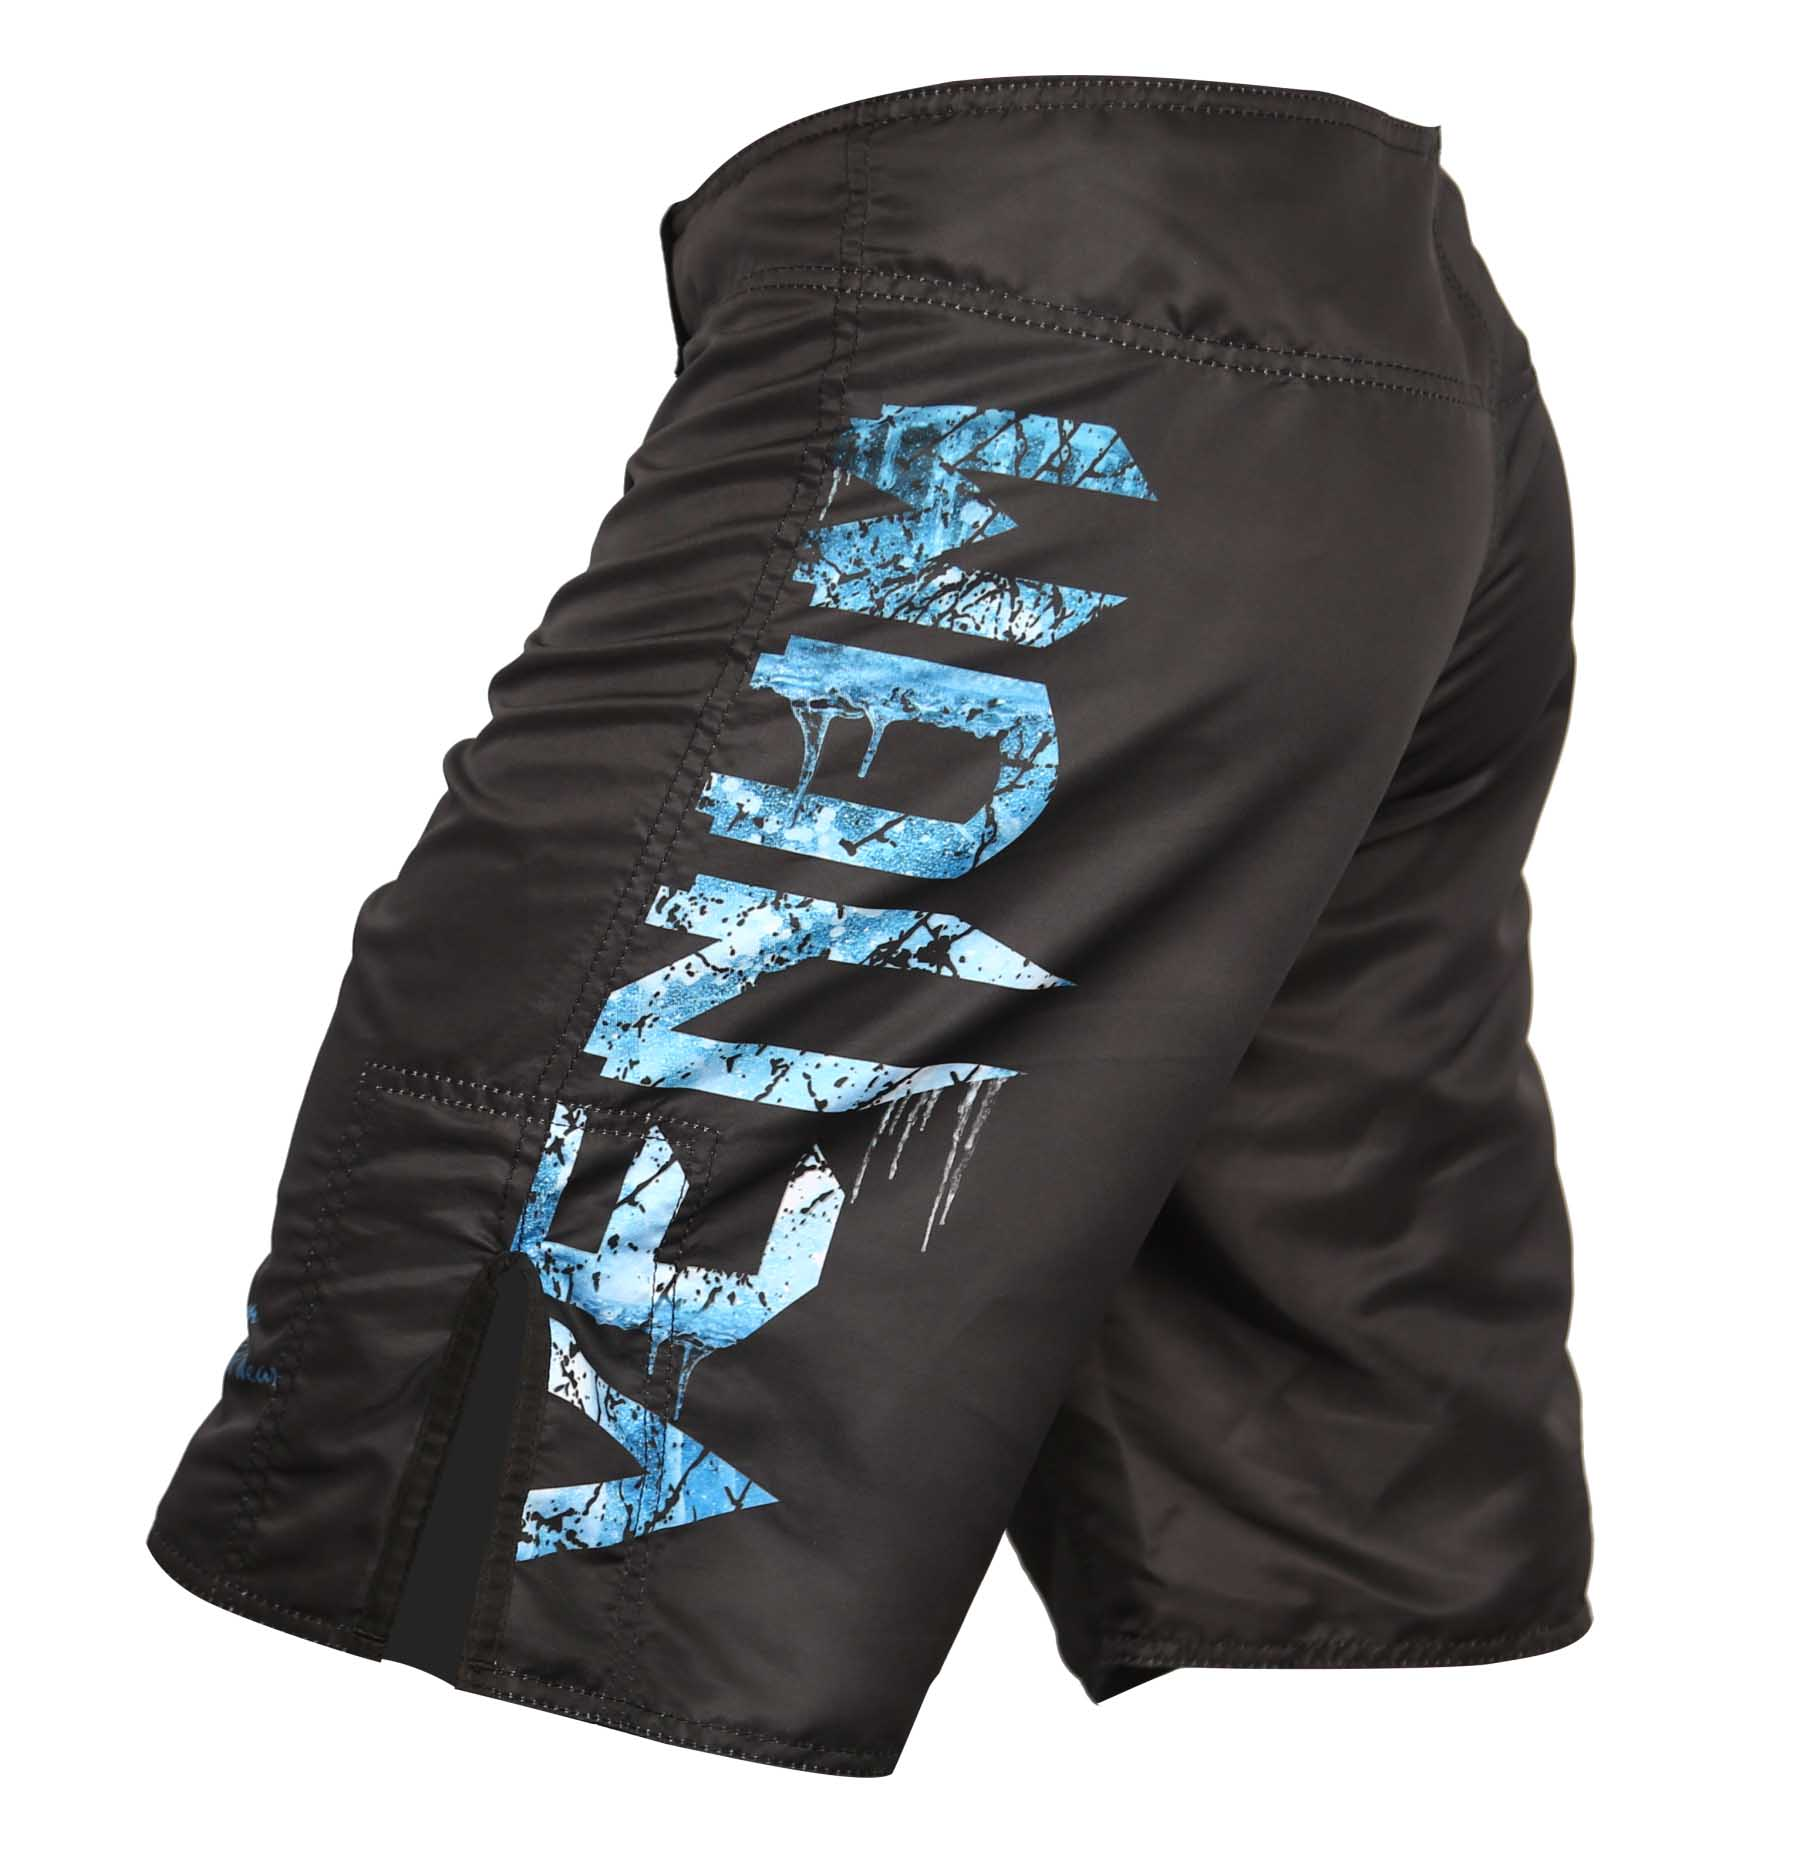 Bermuda MMA - Giant Ice - Preto/Azul - Venum -  - Loja do Competidor